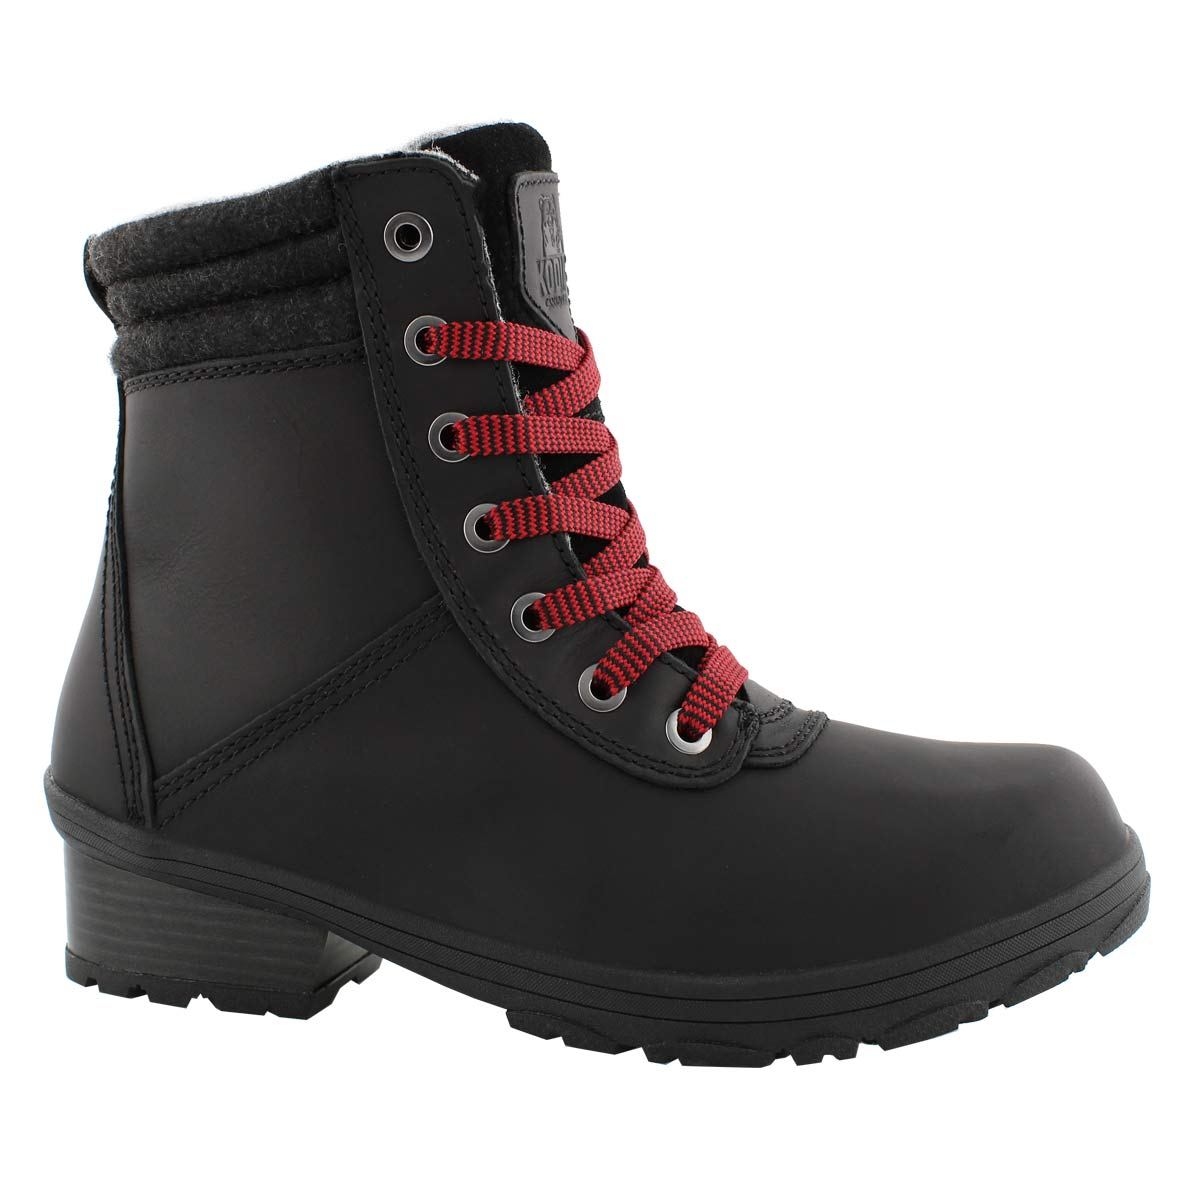 Lds Shari black wtpf lace up winter boot